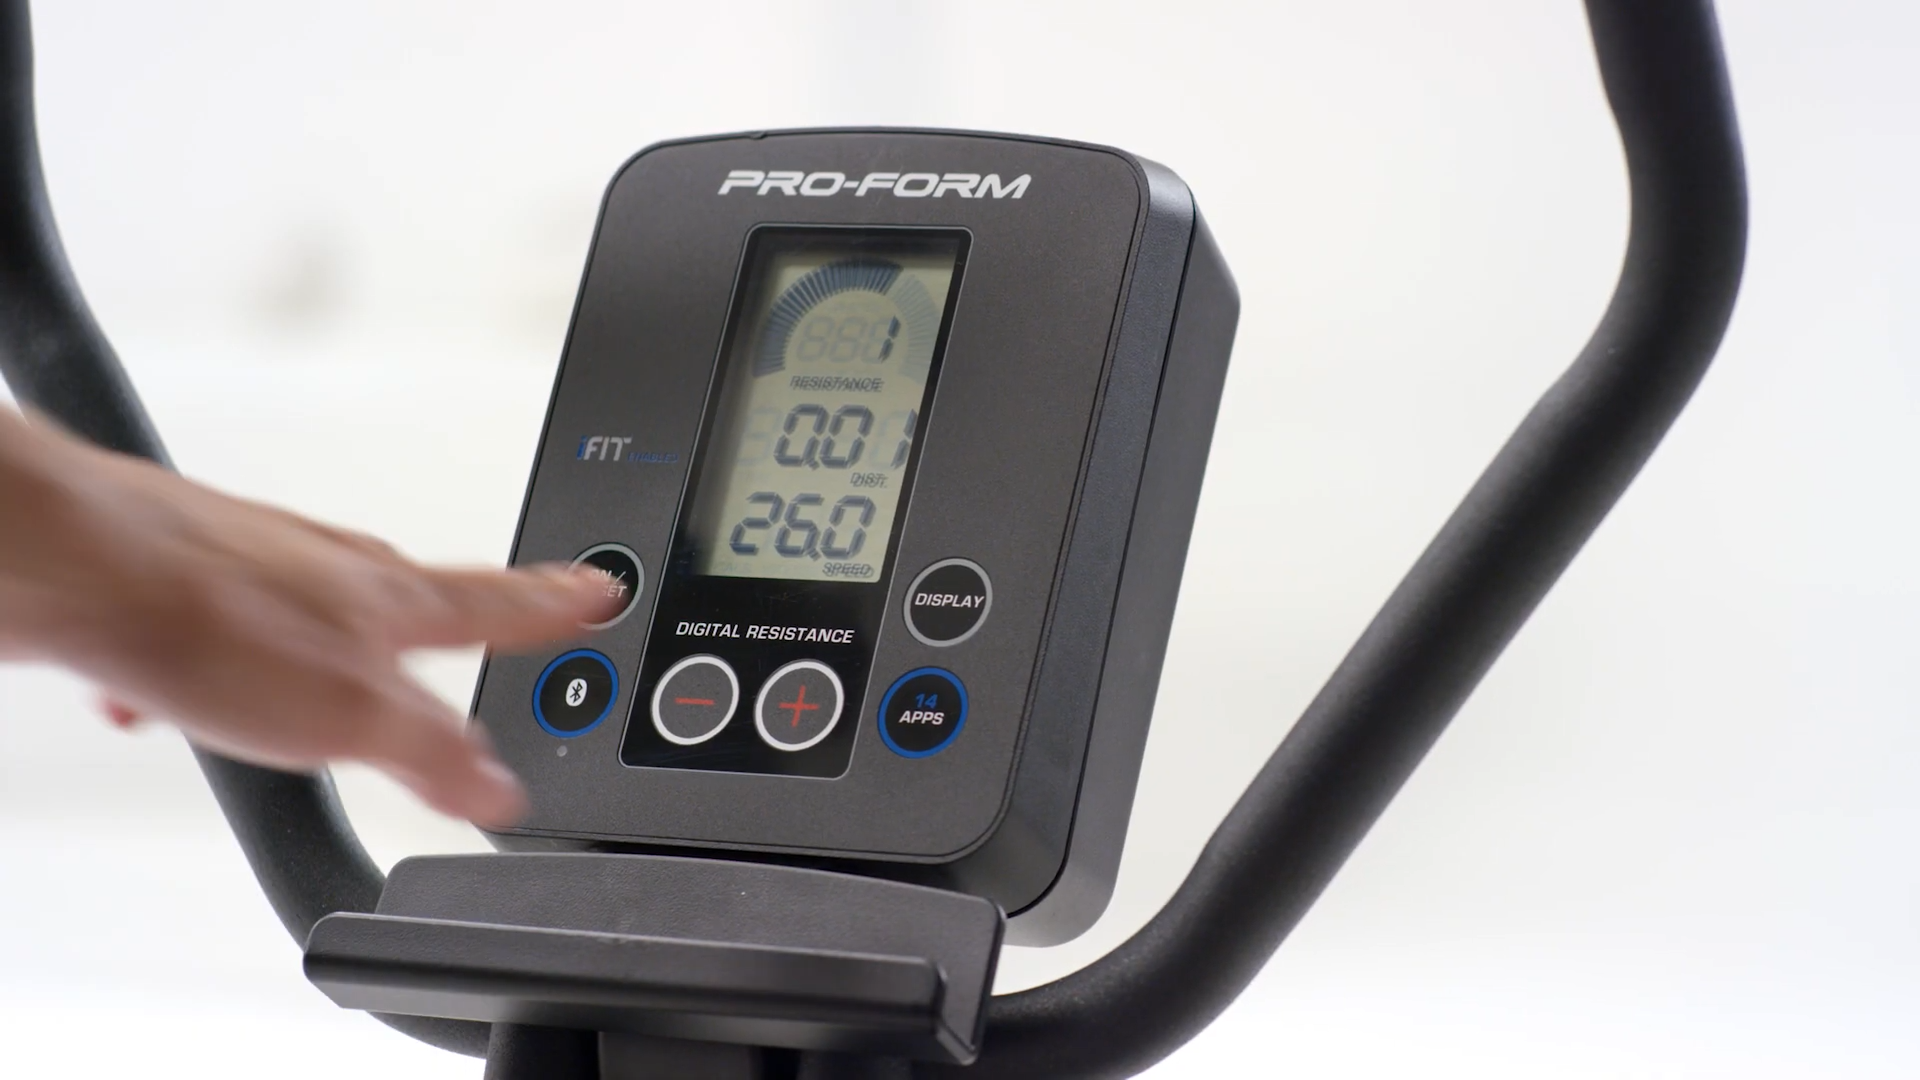 Nordictrack Recumbent Bike Foldable Exercise Bike Biking Workout Assault Bike Workout